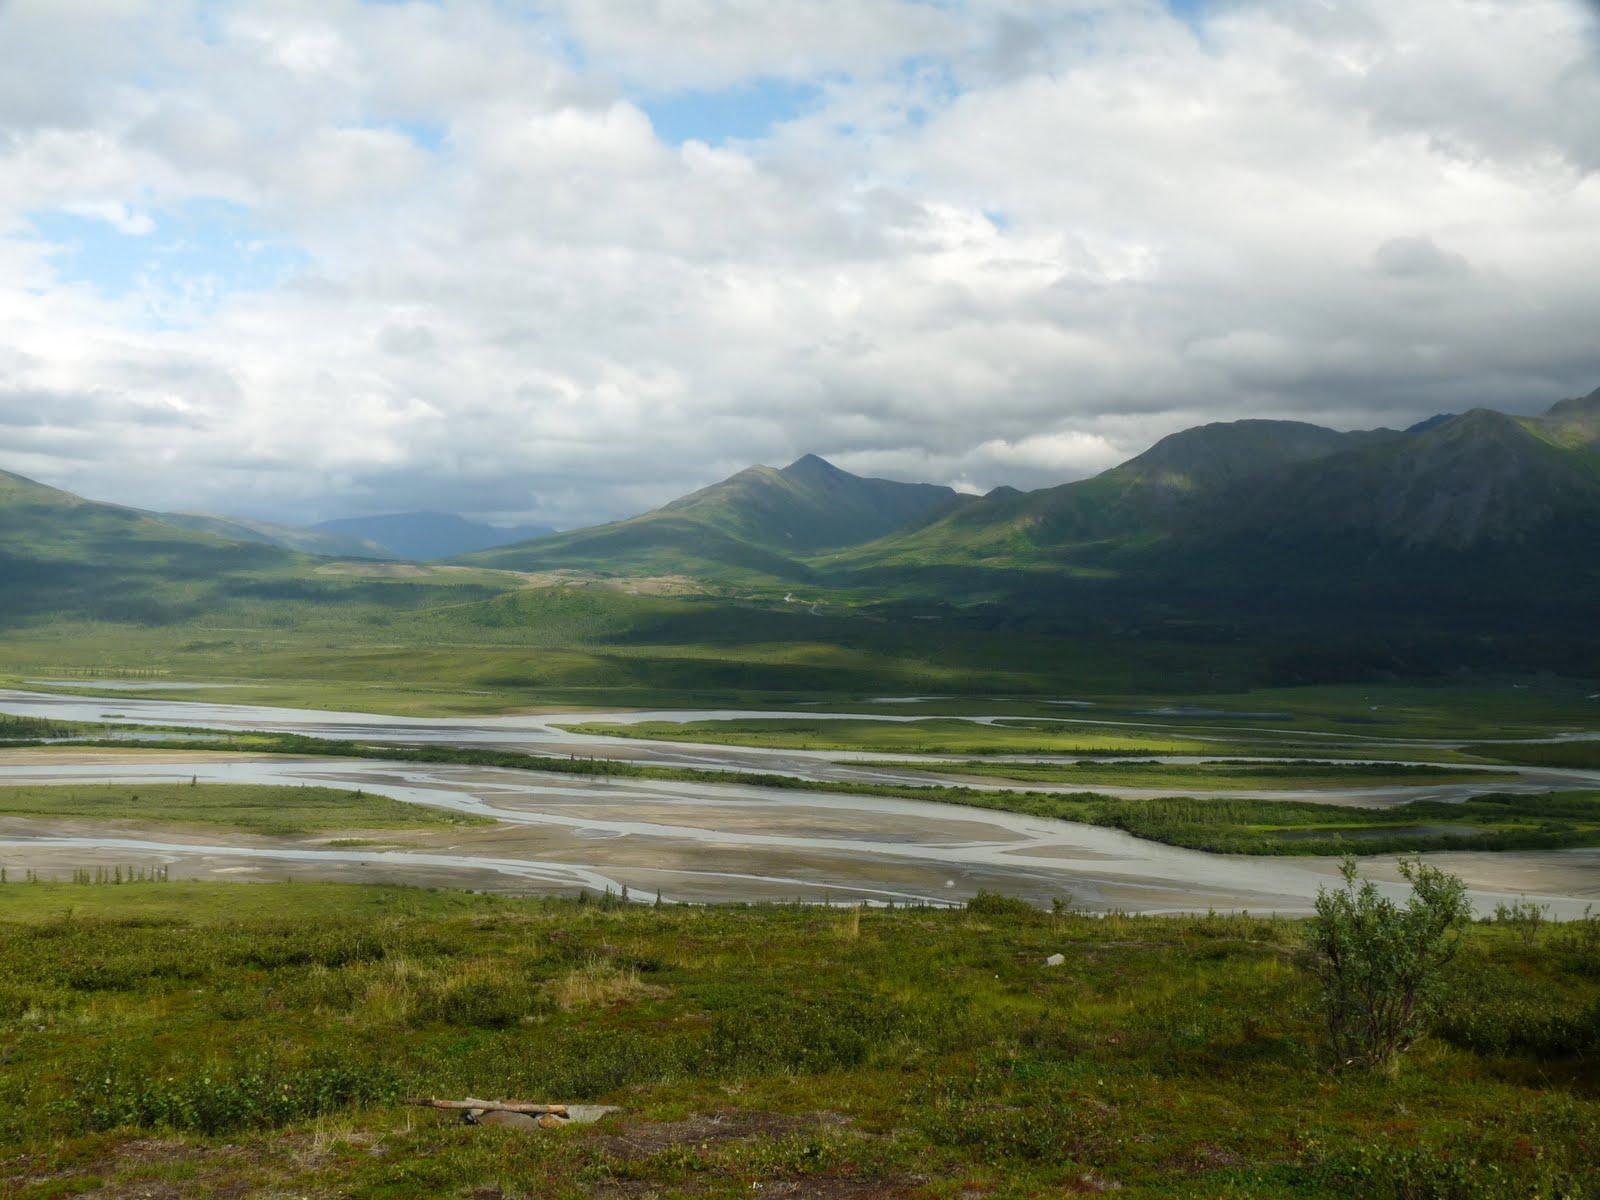 Susitna River, Alaska